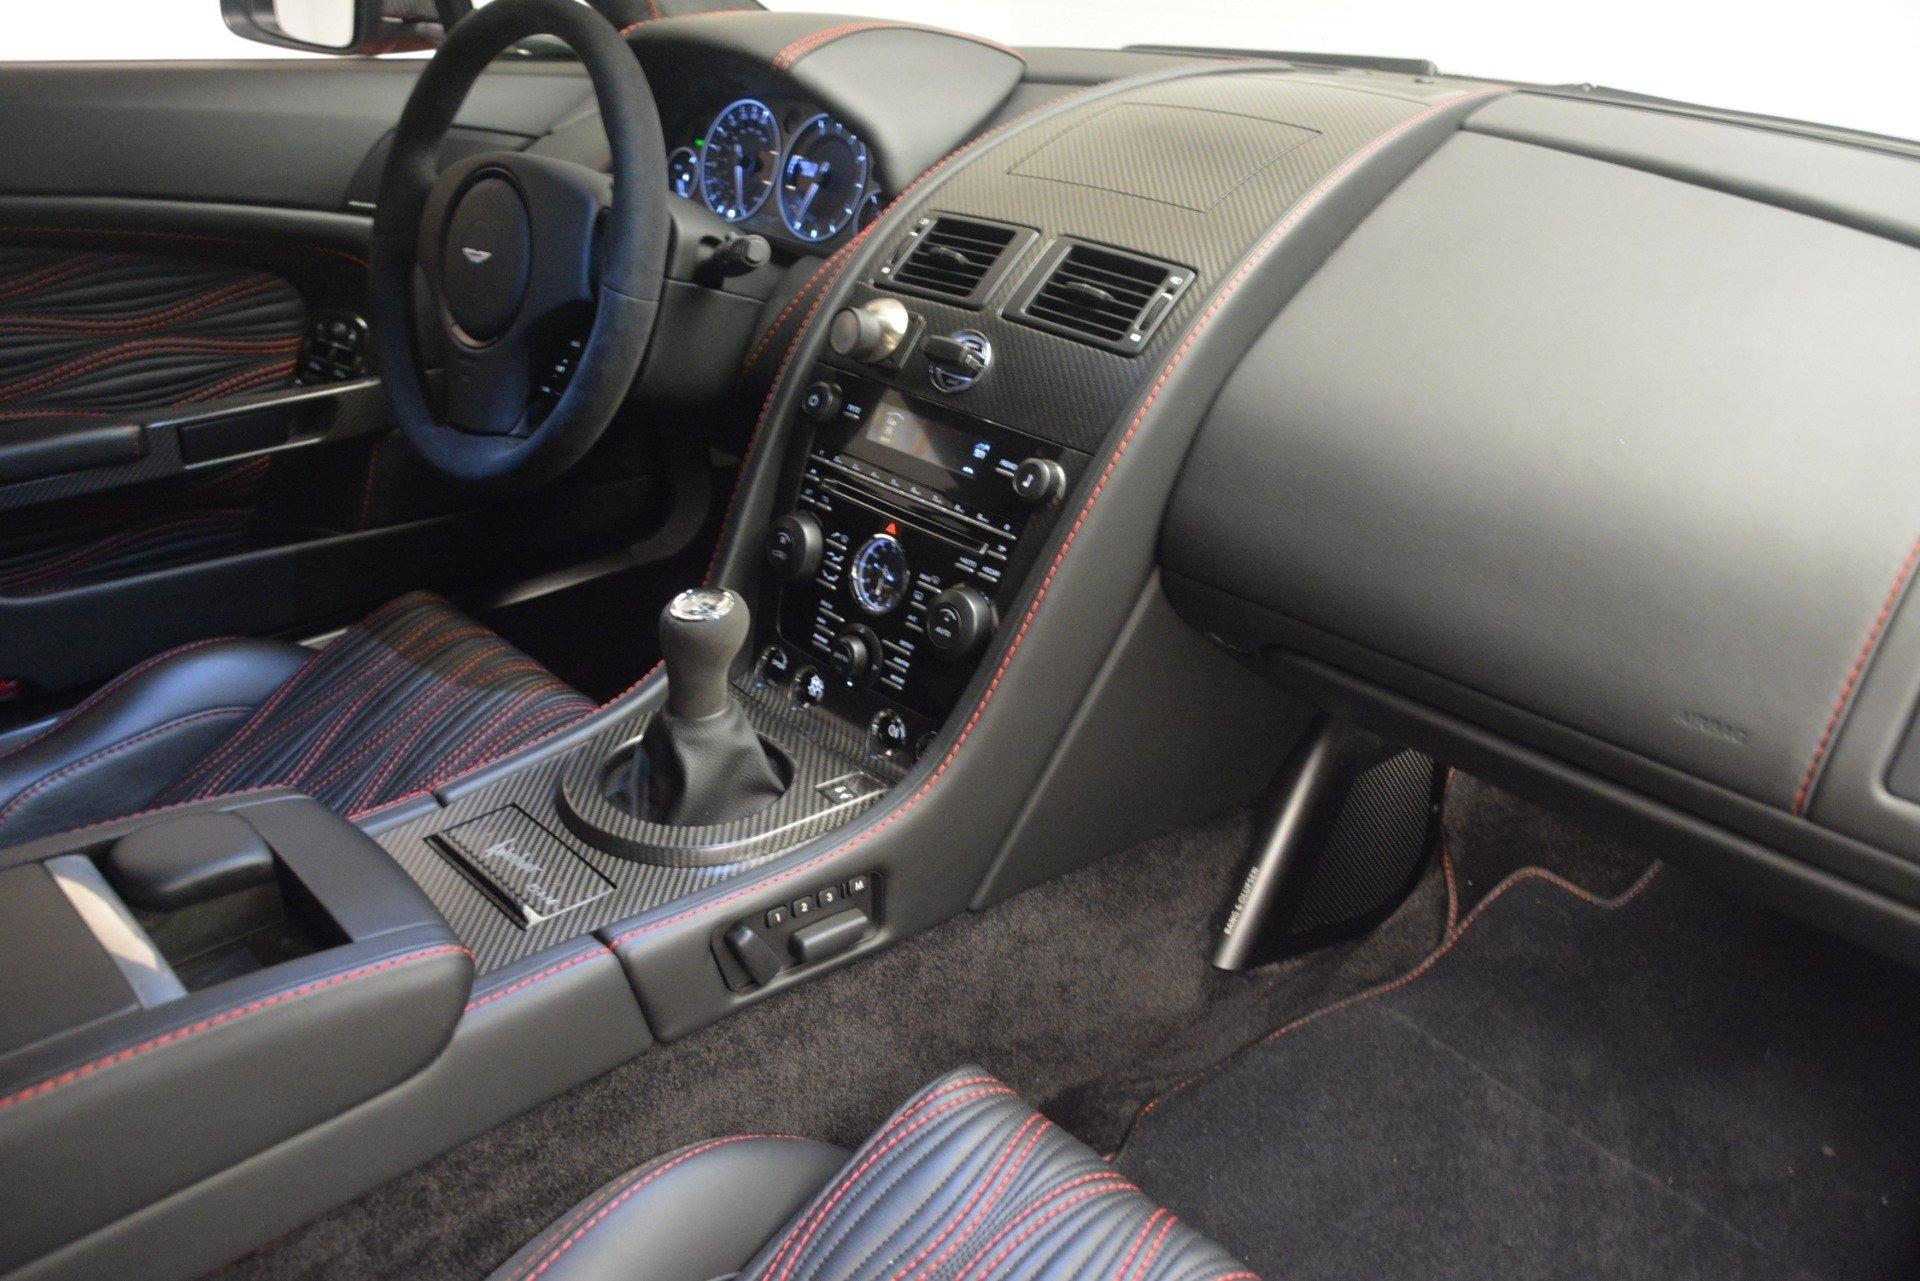 Used 2013 Aston Martin V12 Zagato Coupe For Sale In Westport, CT 3181_p21